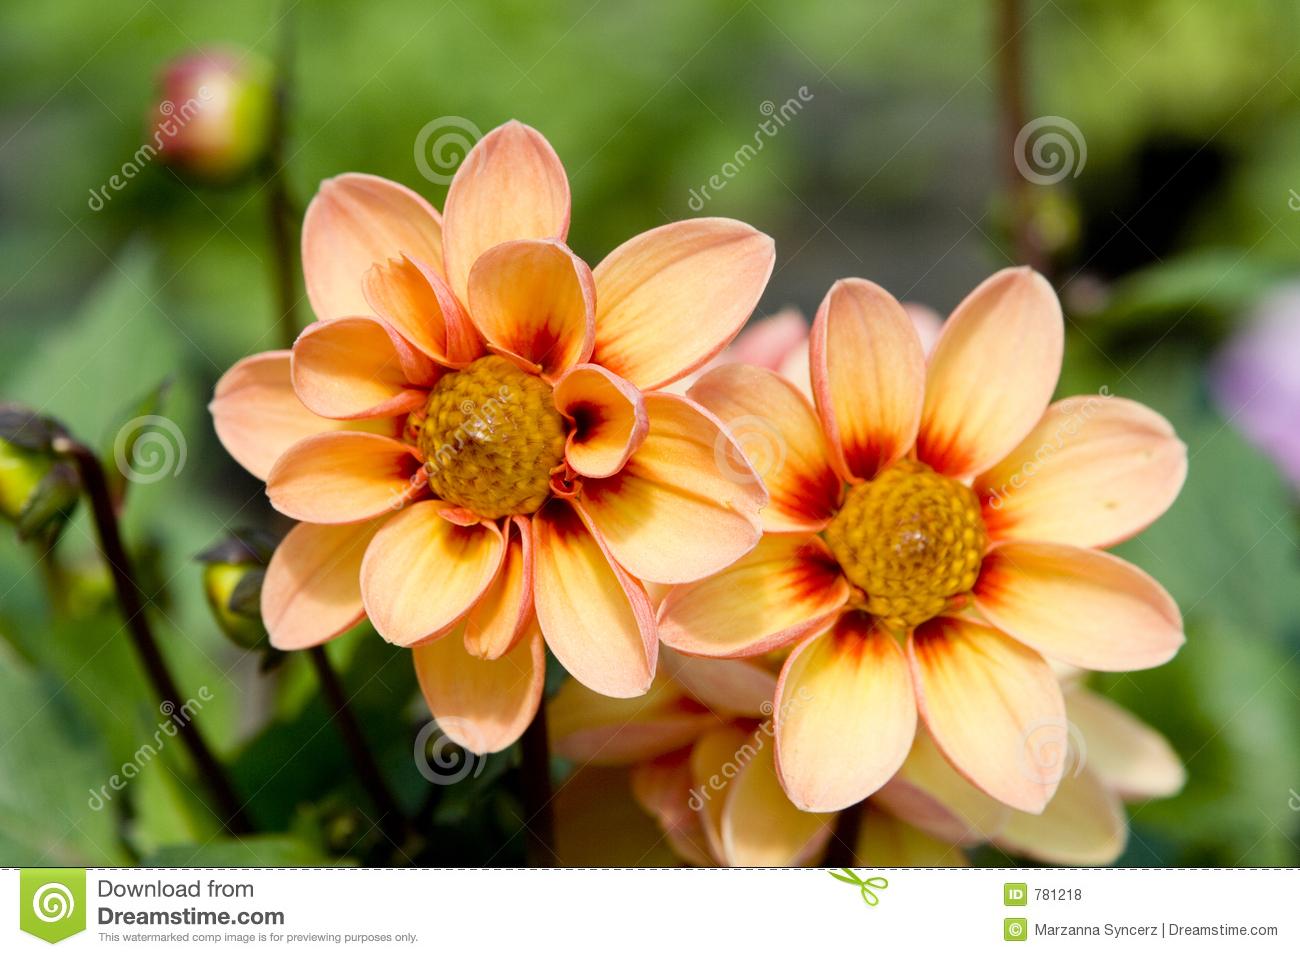 Photos of flowers free svg royalty free Fresh Flowers Royalty Free Stock Photos - Image: 781218 svg royalty free